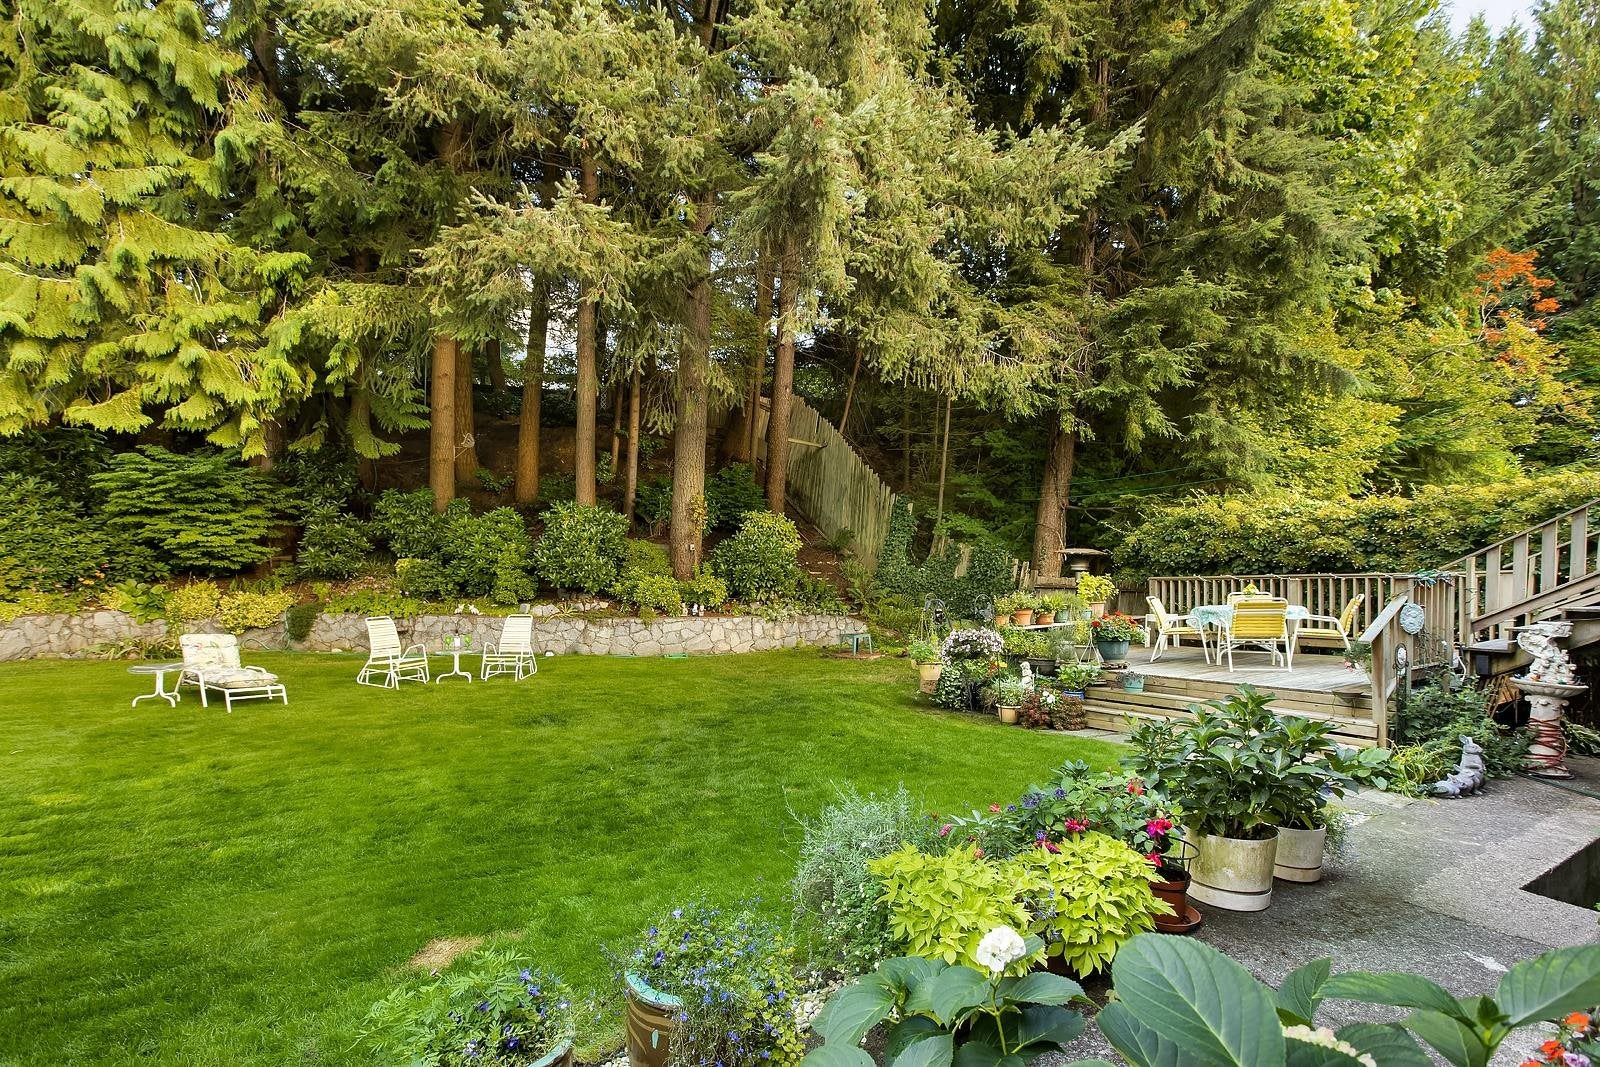 3495 WELLINGTON CRESCENT - Edgemont House/Single Family for sale, 3 Bedrooms (R2617949) - #10